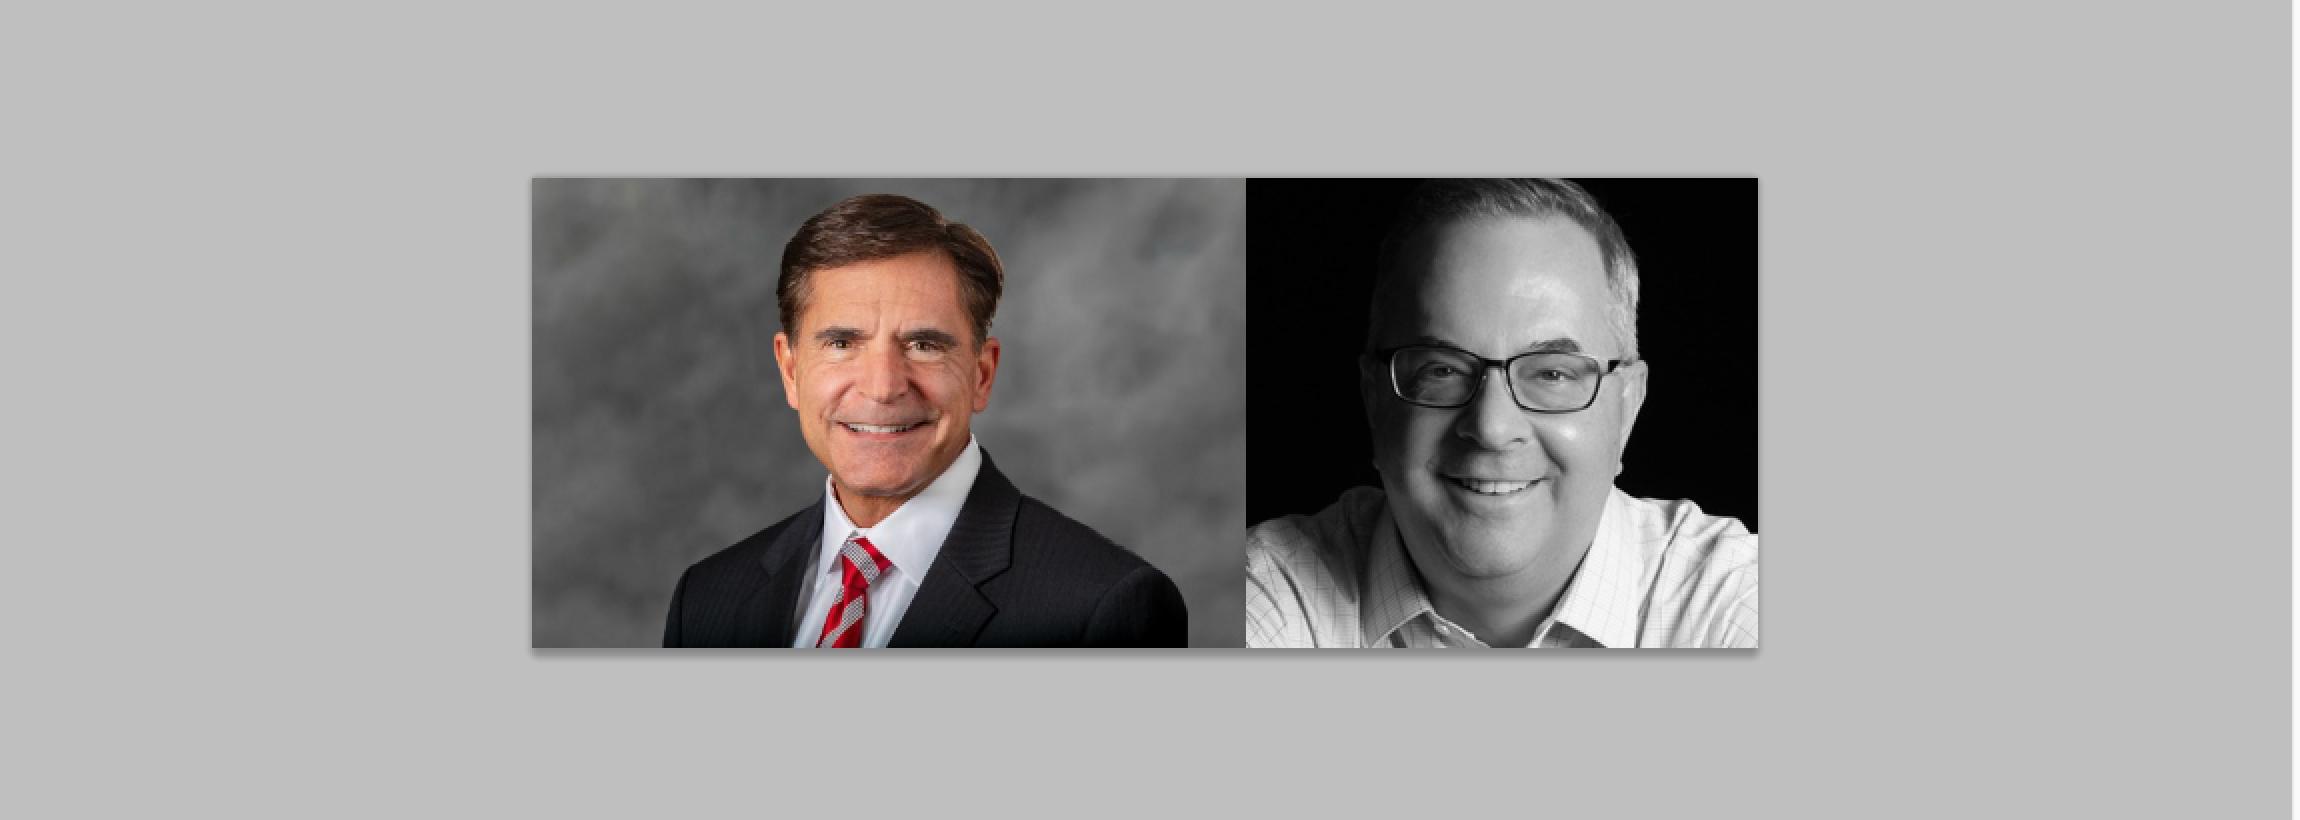 Left: Michael Donfris, Chief Financial Officer, R.J. Corman Railroad Group, LLC. Right: Kevin Shuba, The Broe Group